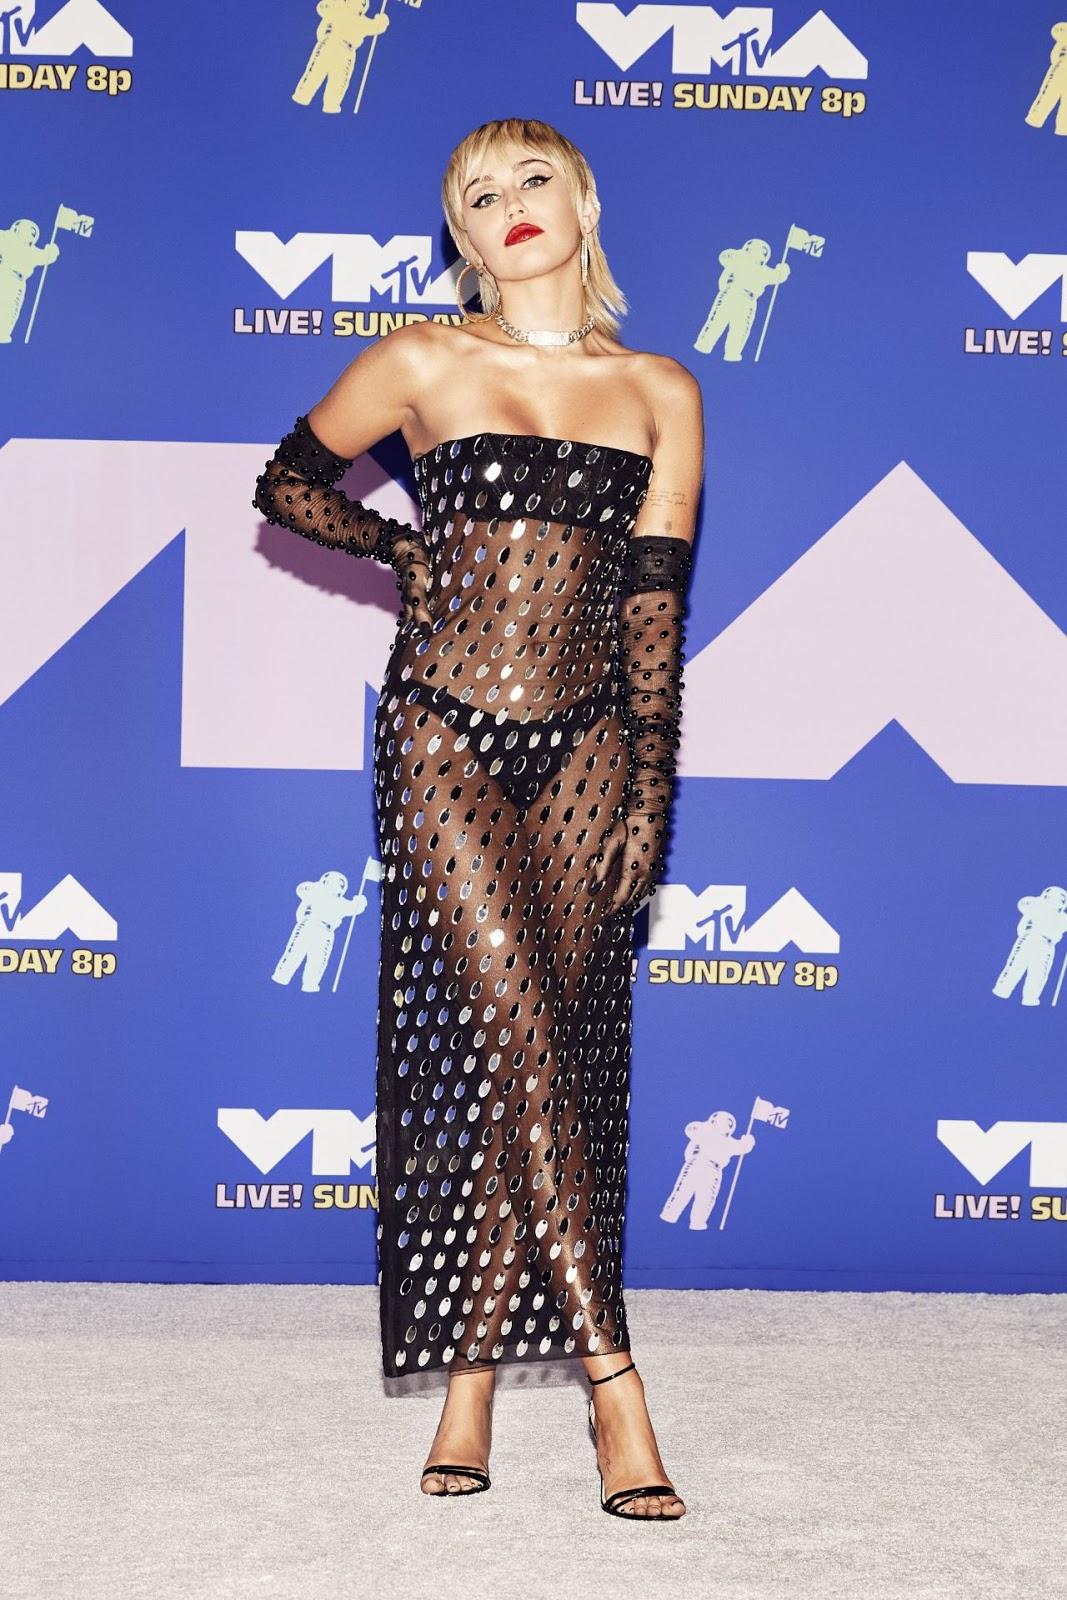 Miley Cyrus Wore a Sheer, Super-Sexy Dress at the VMAs